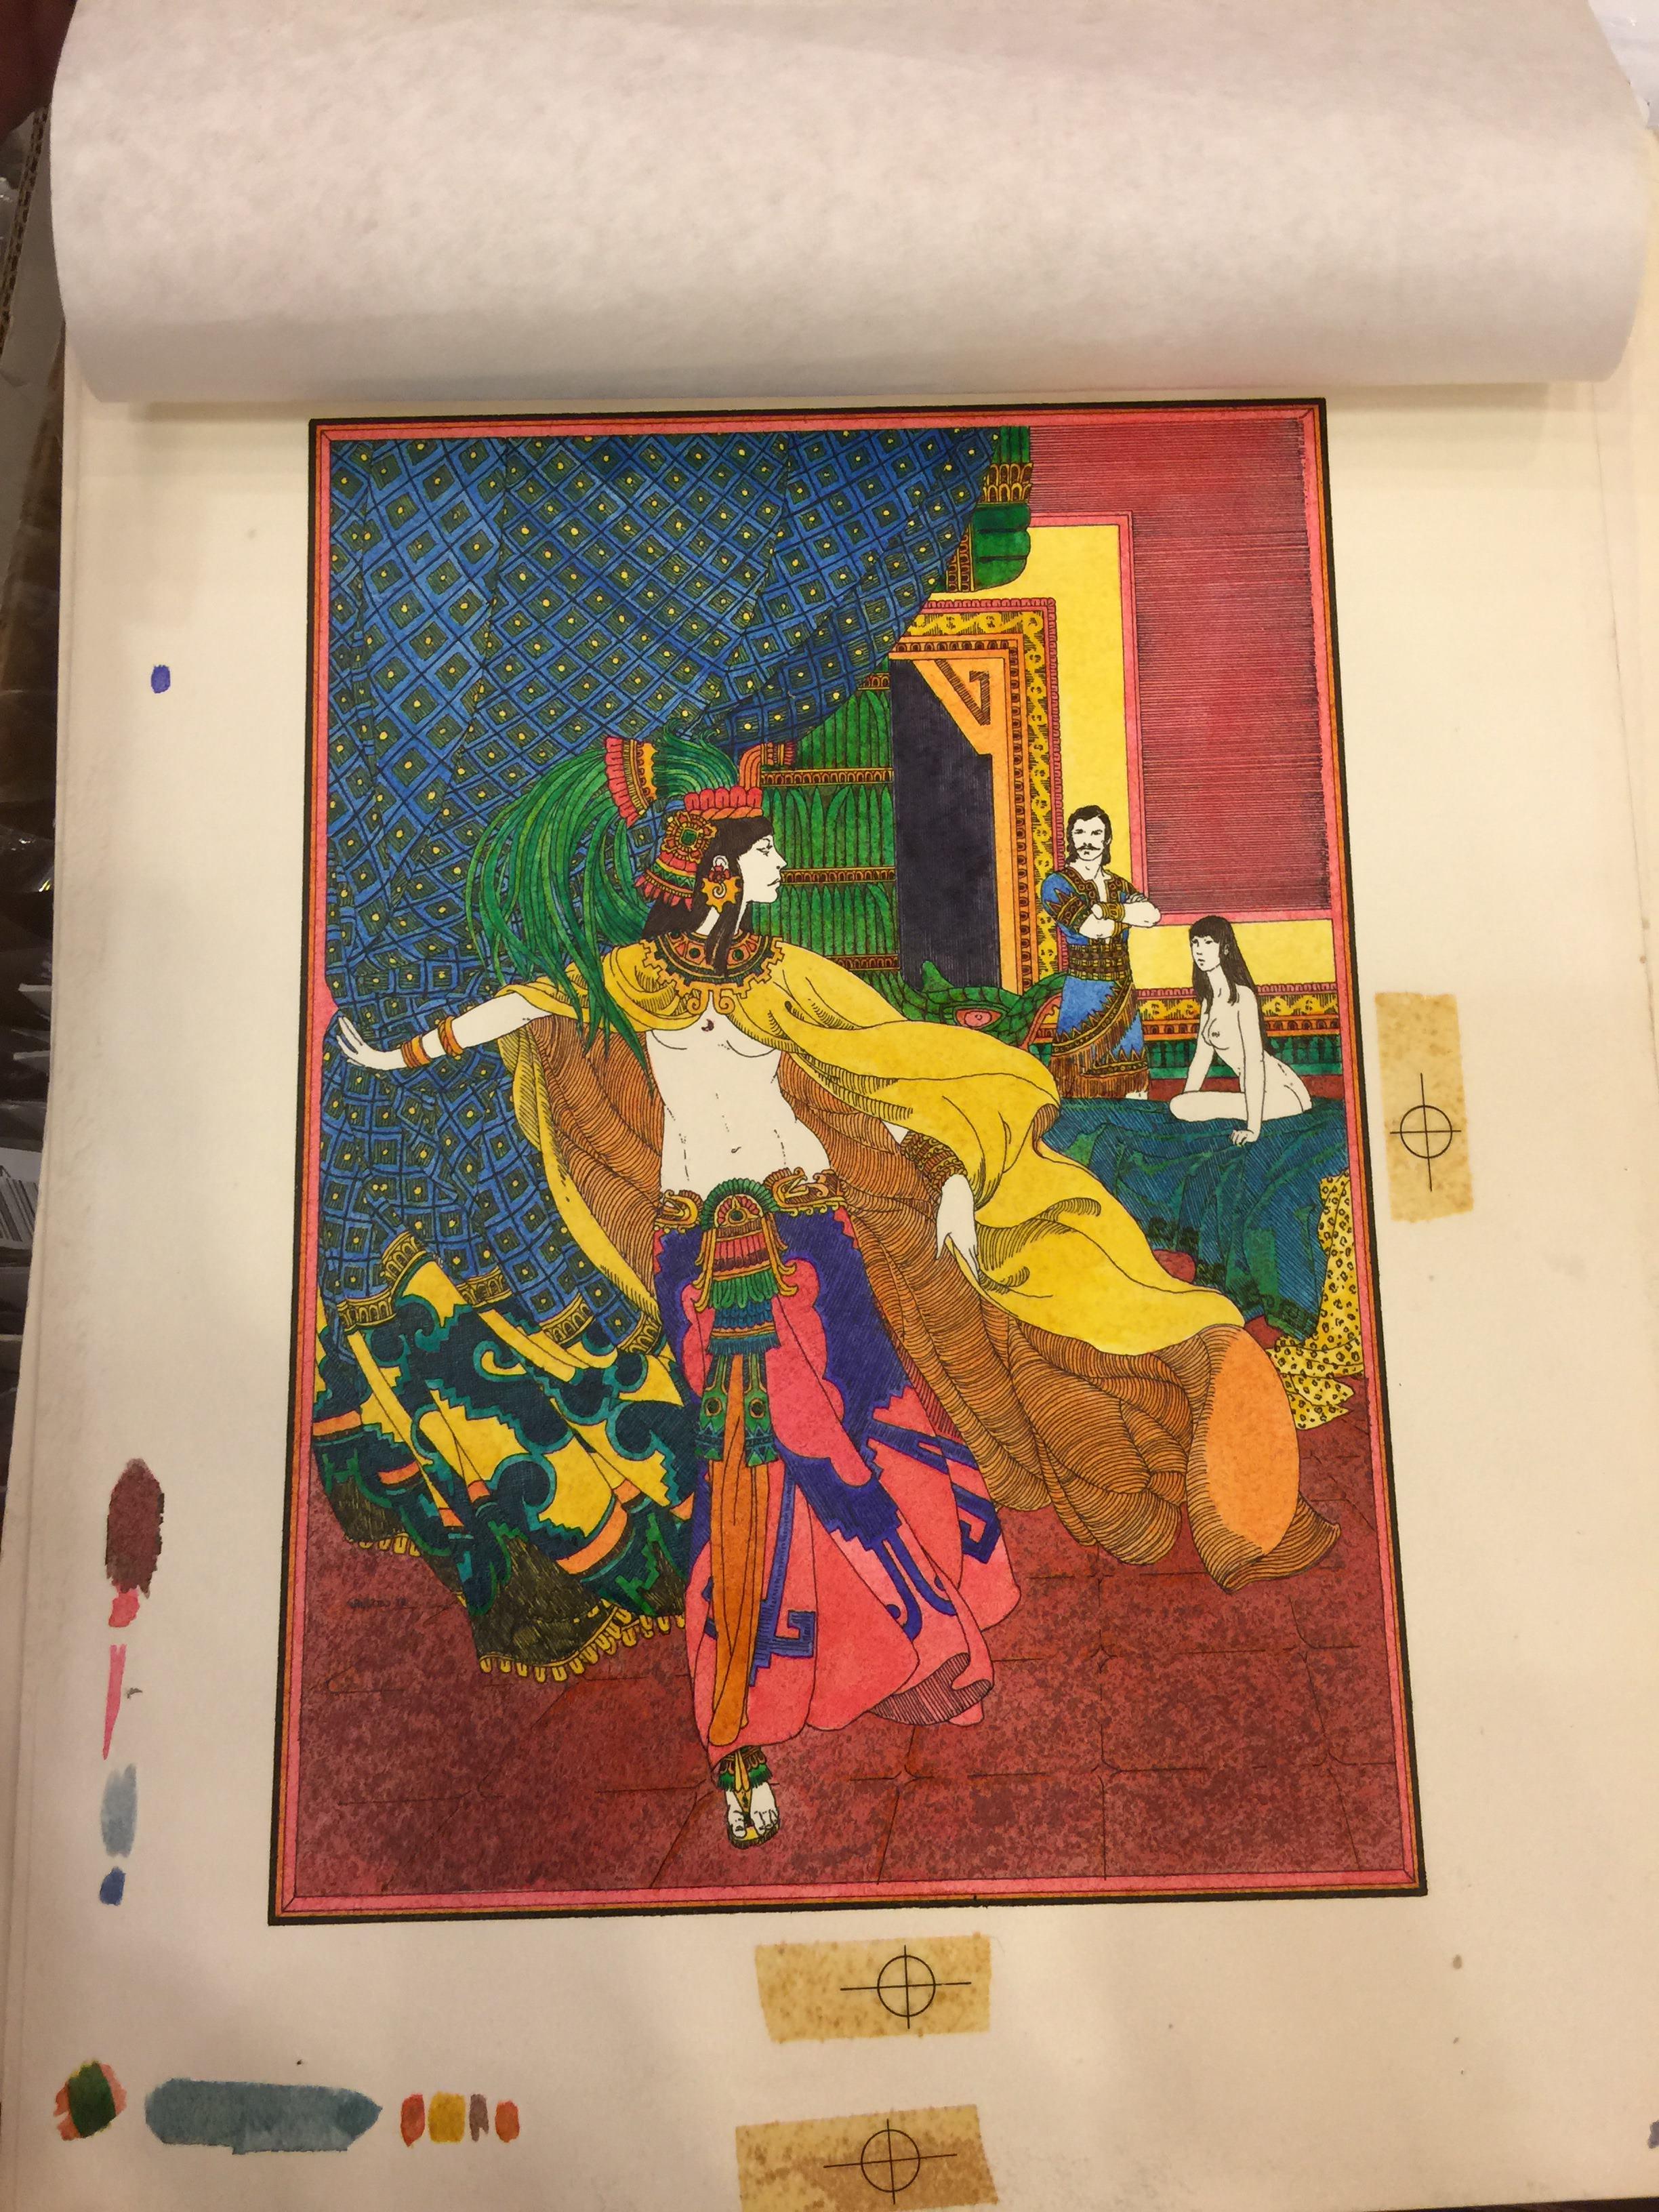 Original illustration for Conan the Barbarian book by Robert E. Howard